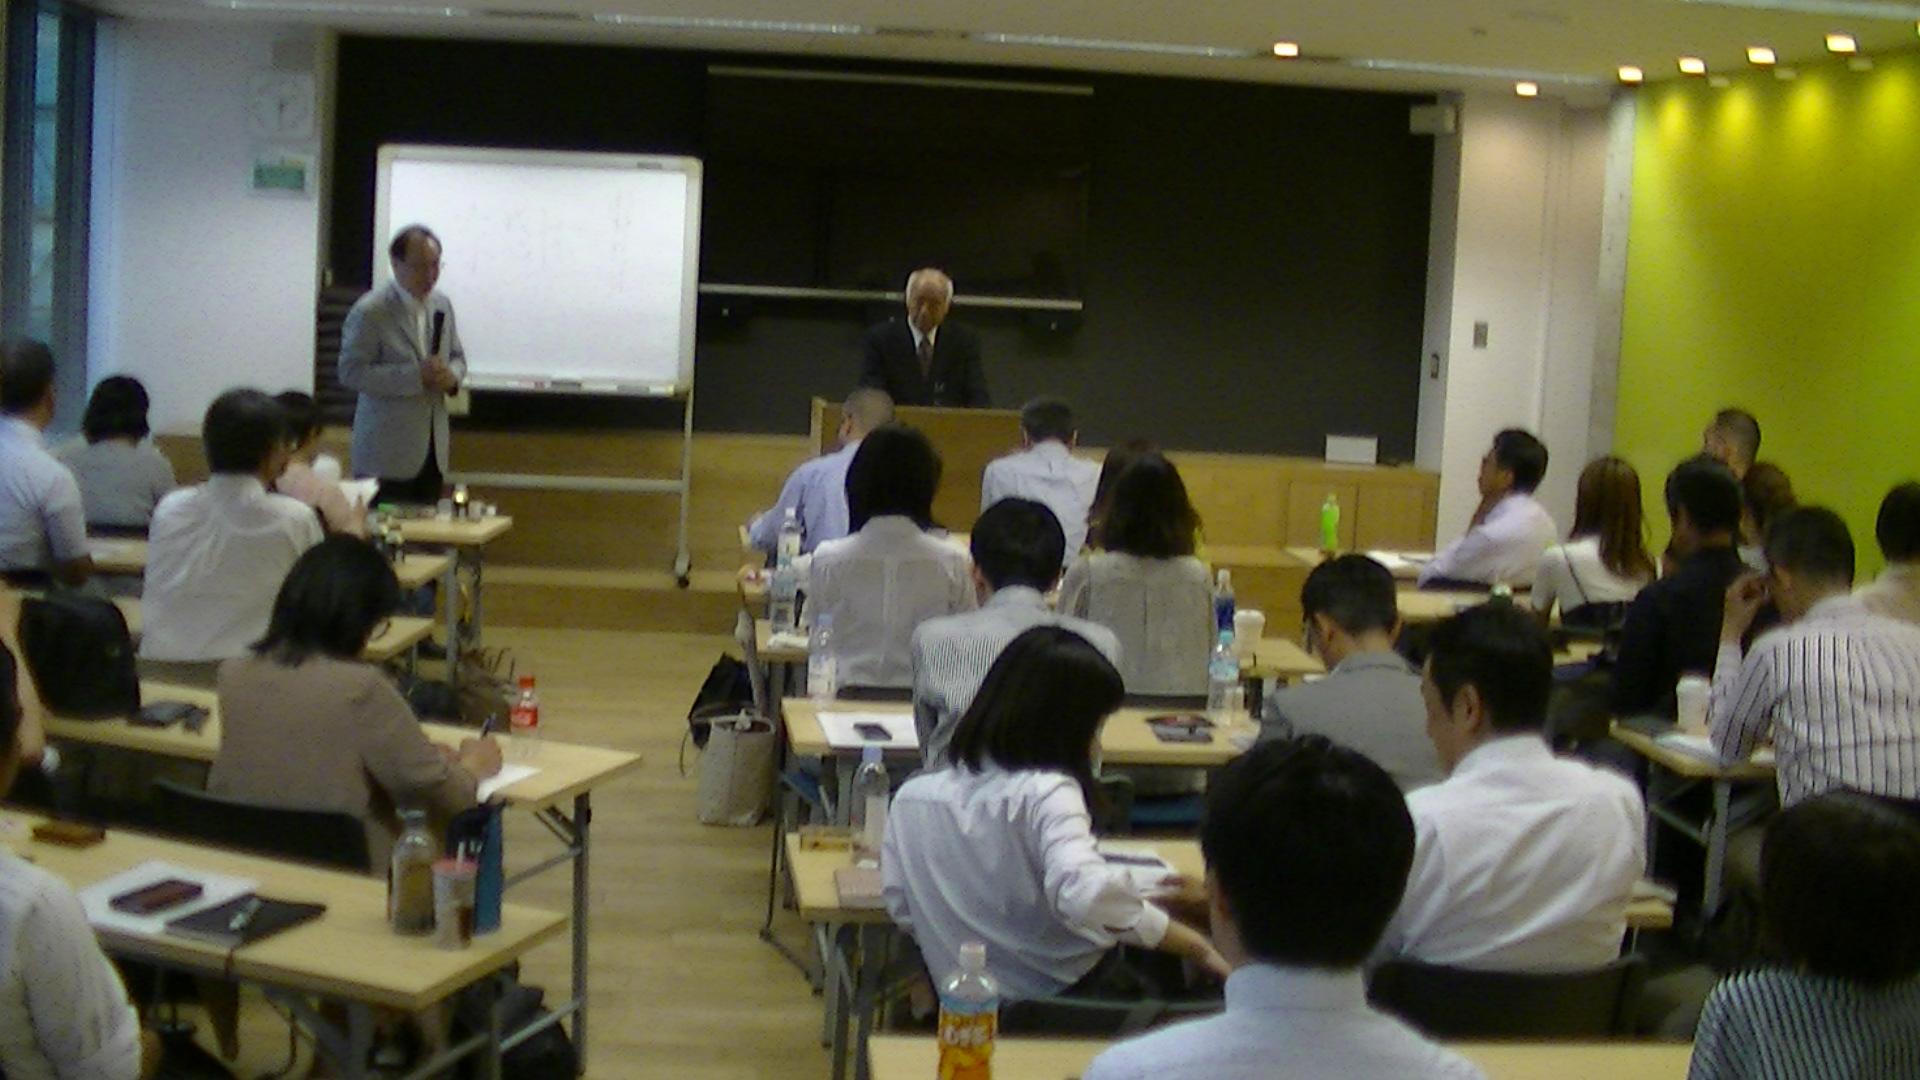 PIC 1073 - 思風会全国大会in広島